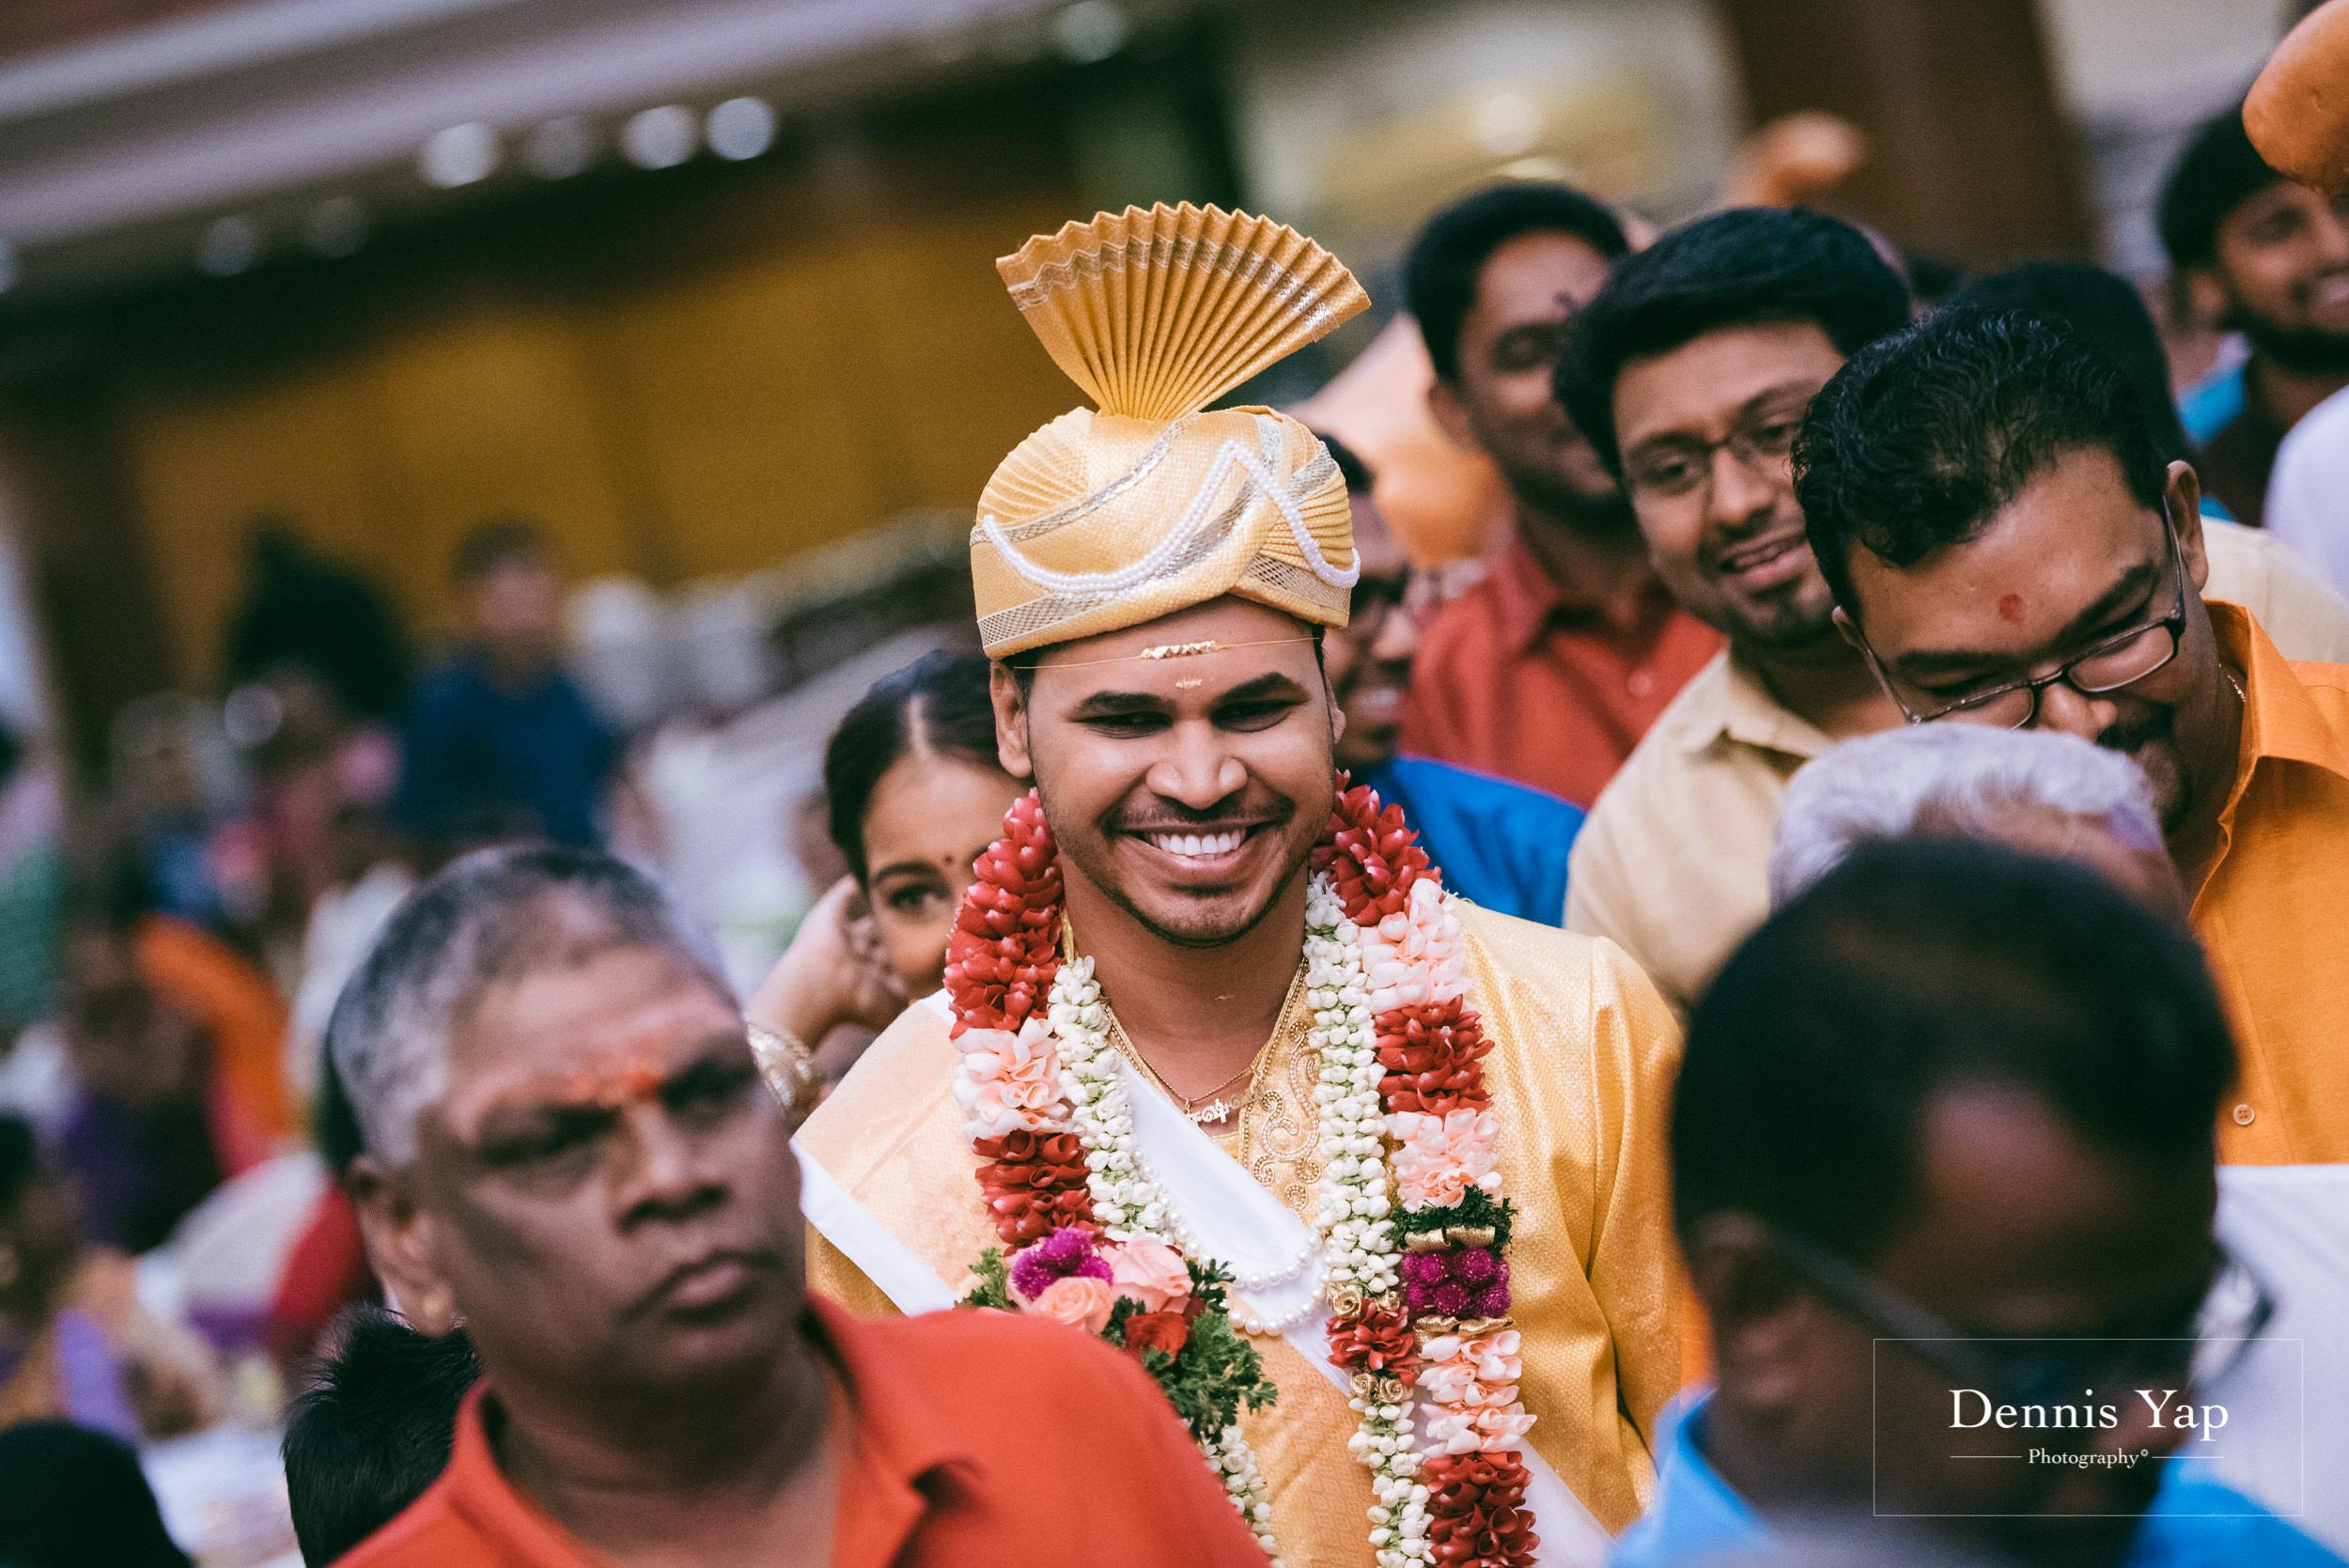 puvaneswaran cangitaa indian wedding ceremony ideal convention dennis yap photography malaysia-19.jpg